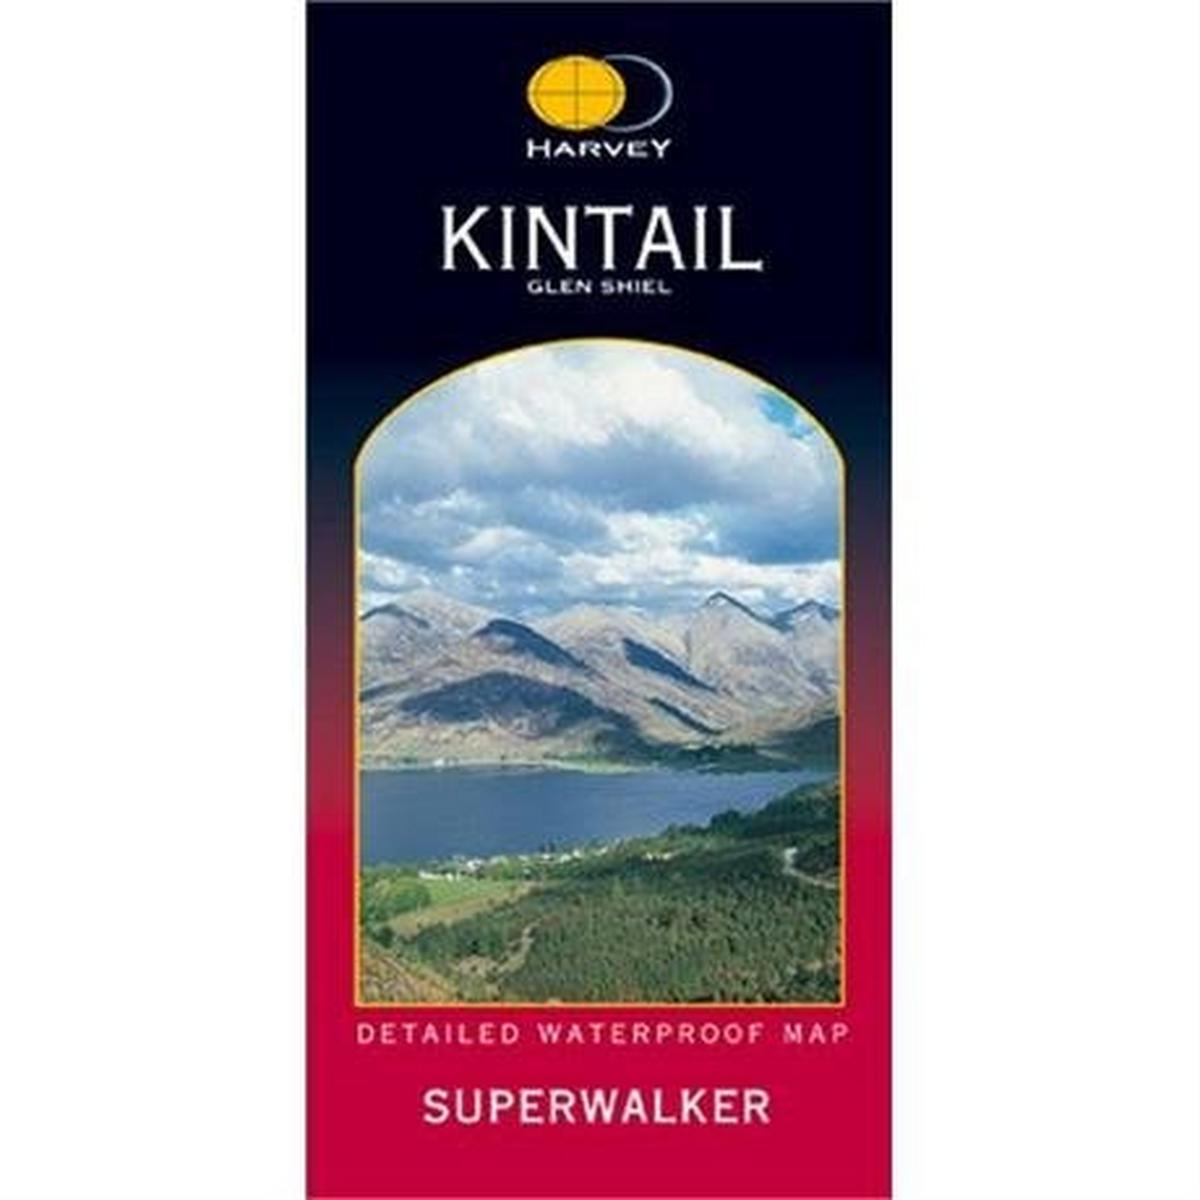 Harveys Harvey Map - Superwalker: Kintail & Glen Shiel